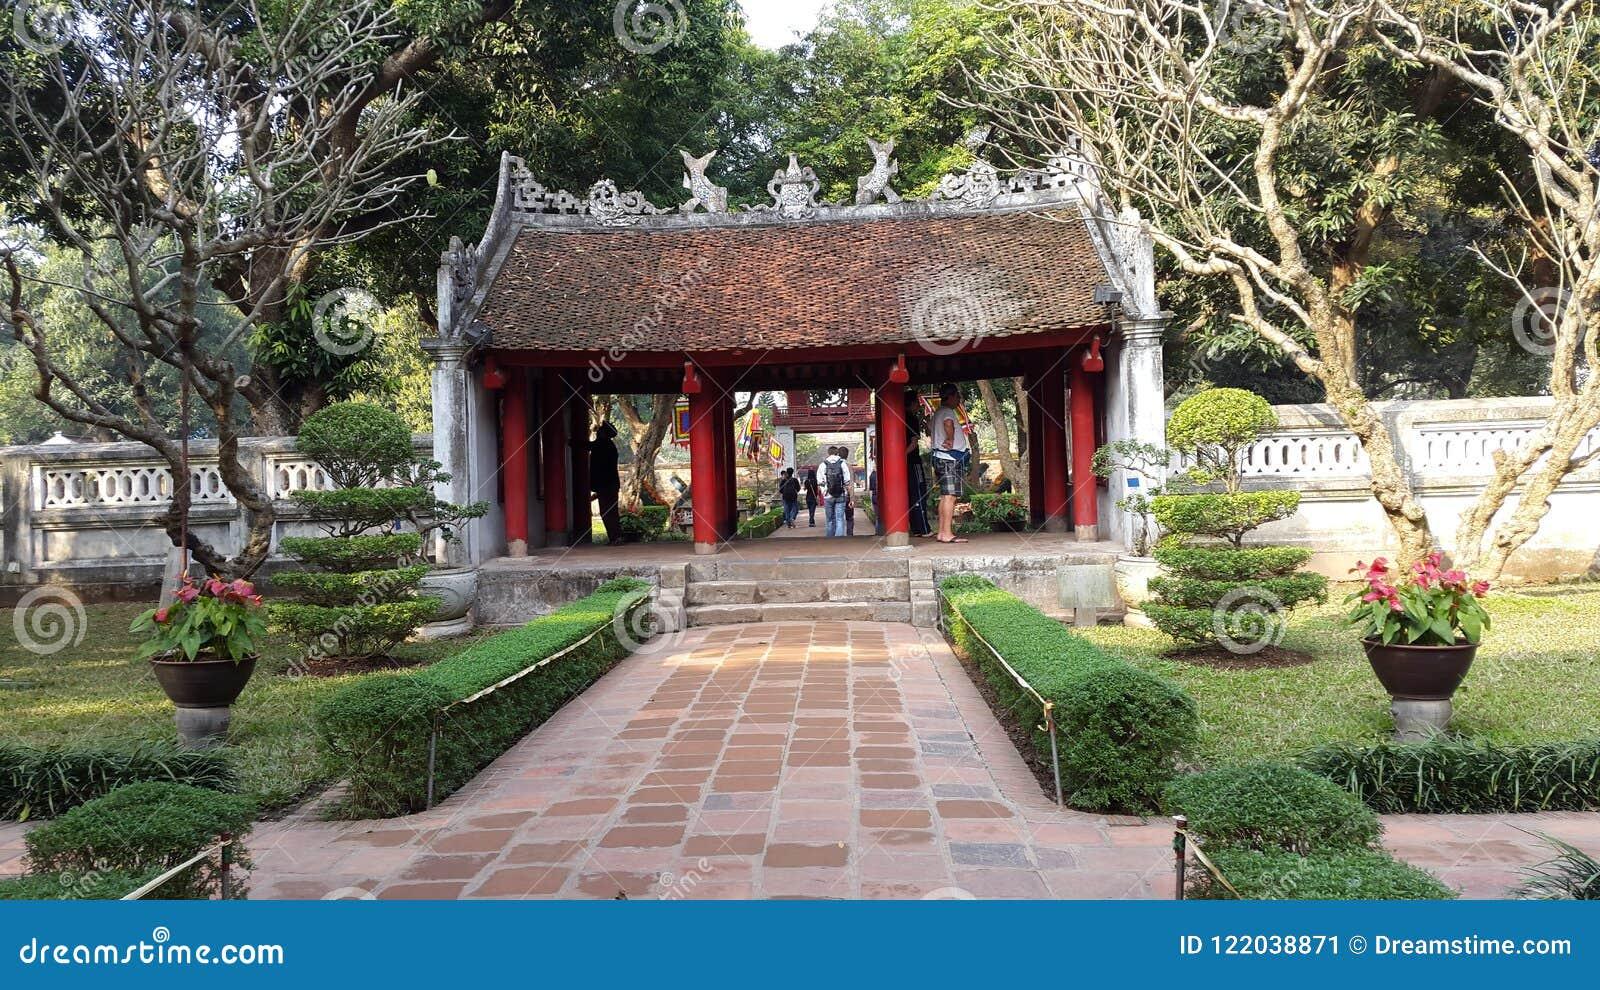 Khue Van pavilion, Tempel der Literatur, Hanoi, Vietnam